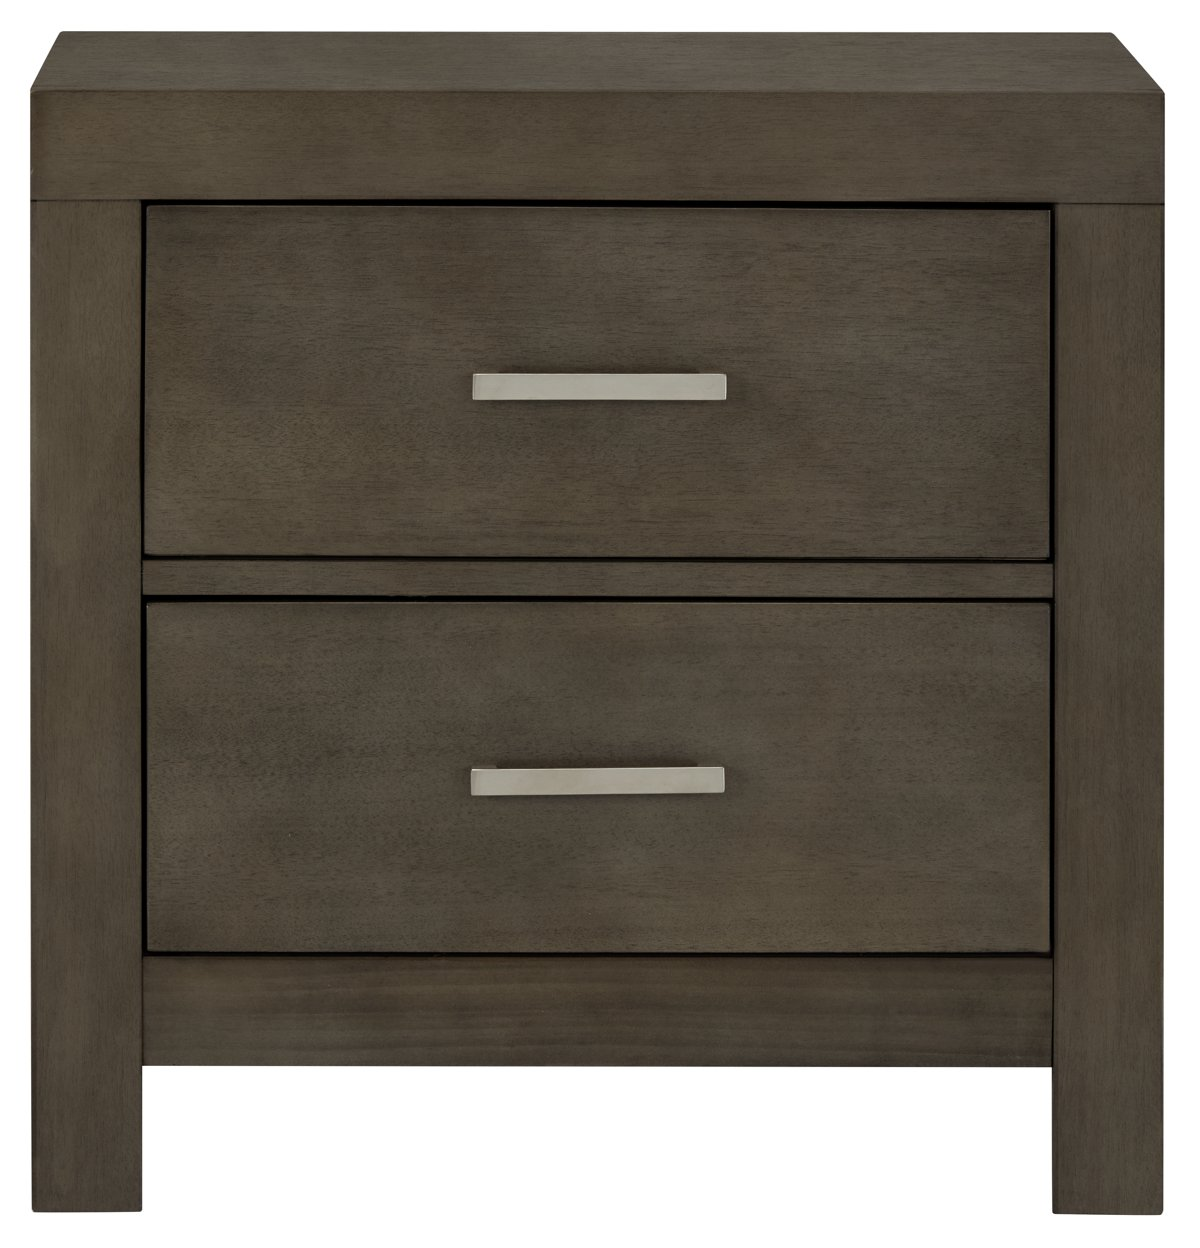 Bedroom Furniture Omaha city furniture: omaha gray nightstand